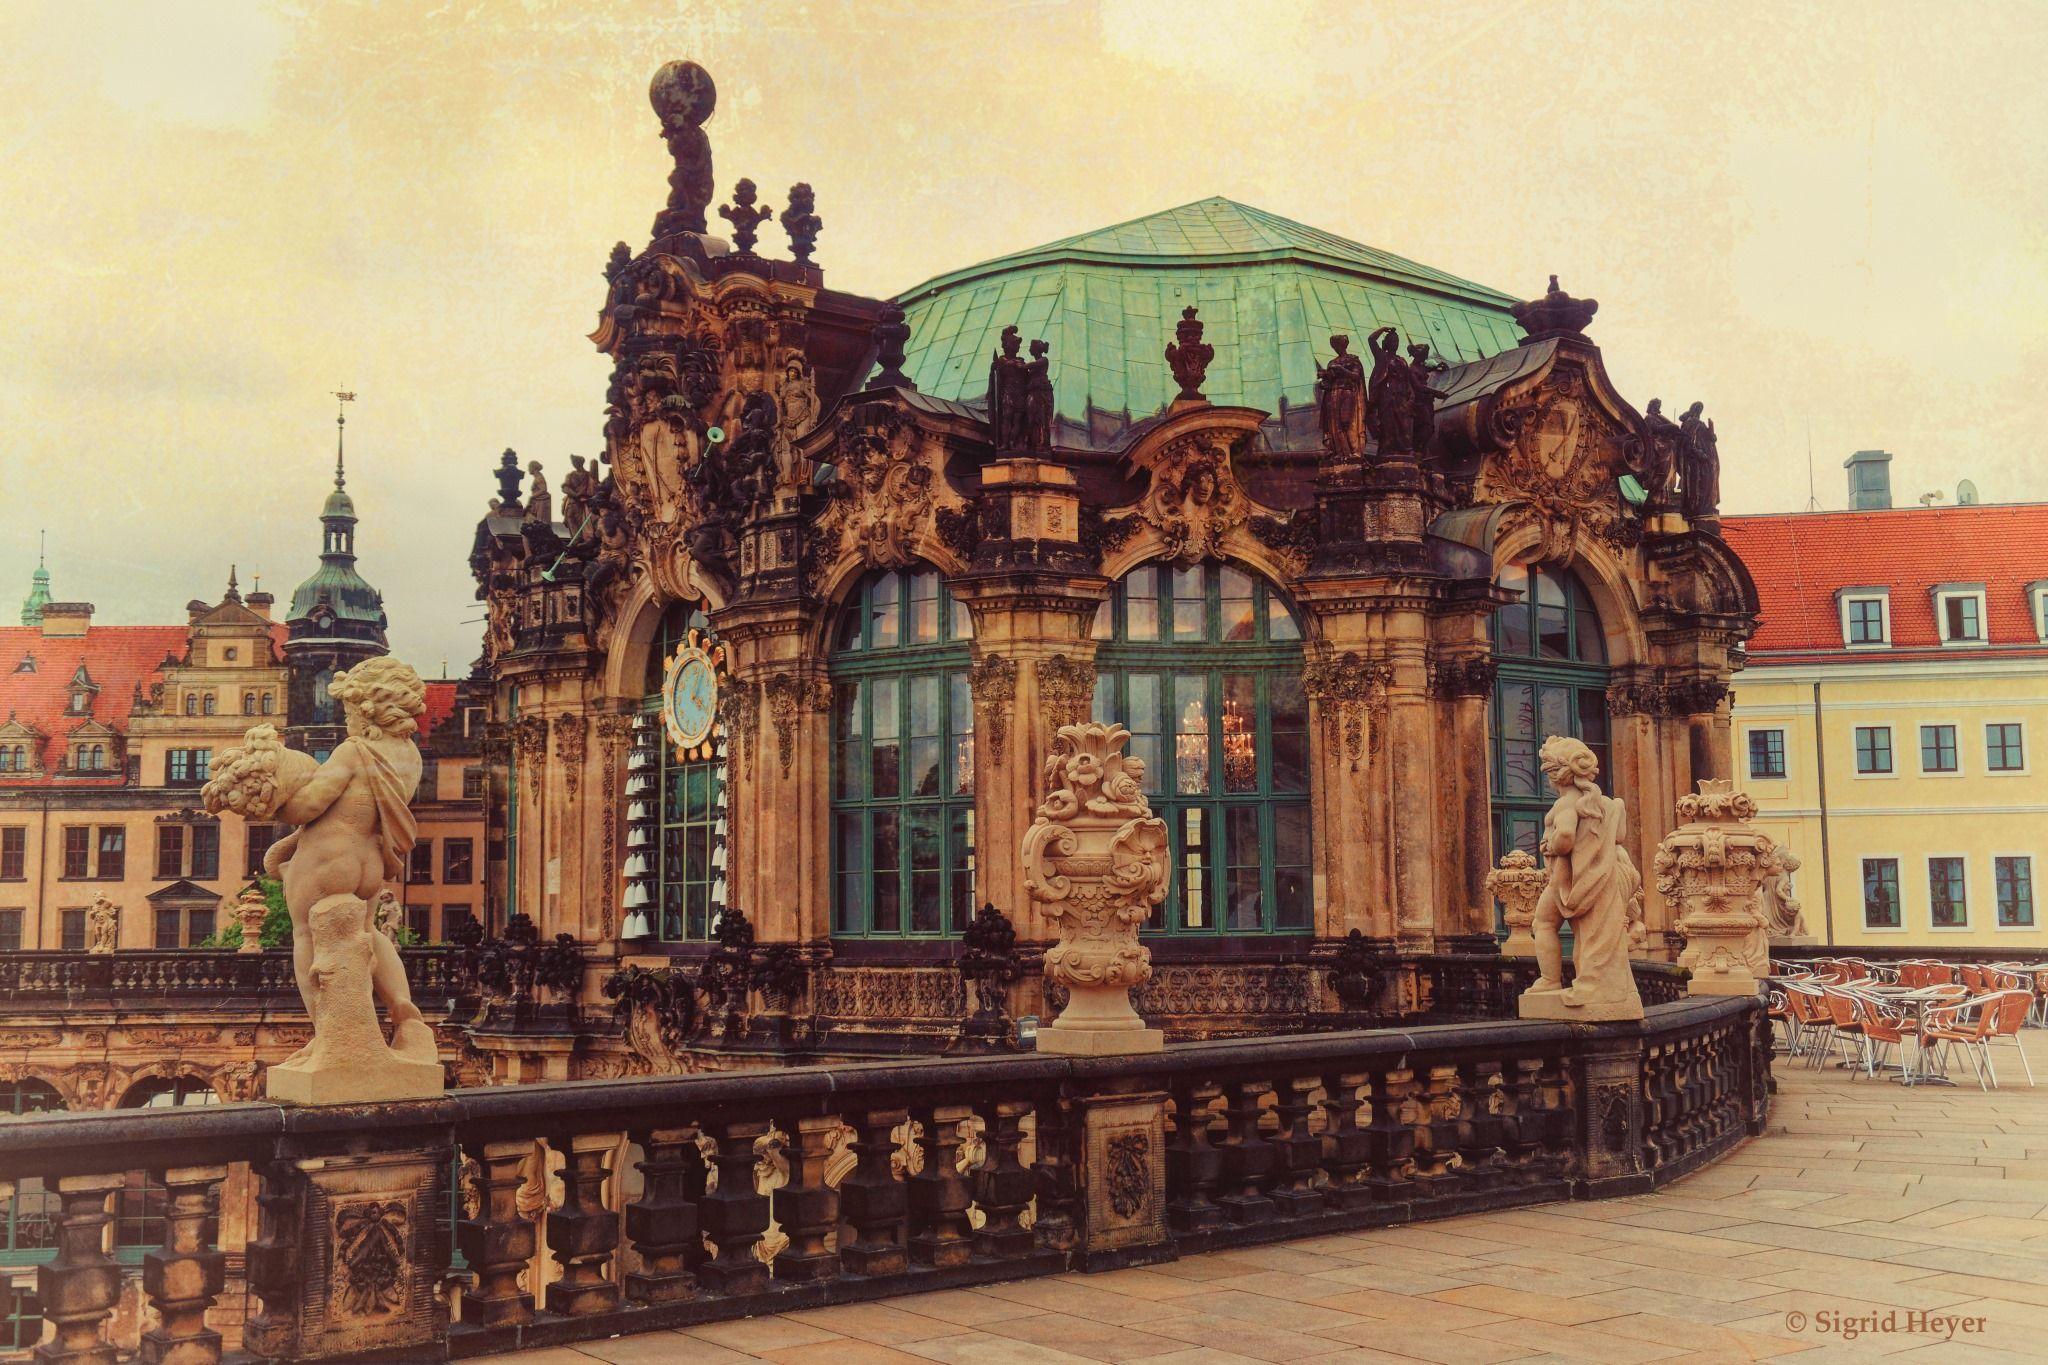 Blick Zum Glockenspielpavillon C Sigrid Heyer Fotokunst Dresdner Zwinger Dresden